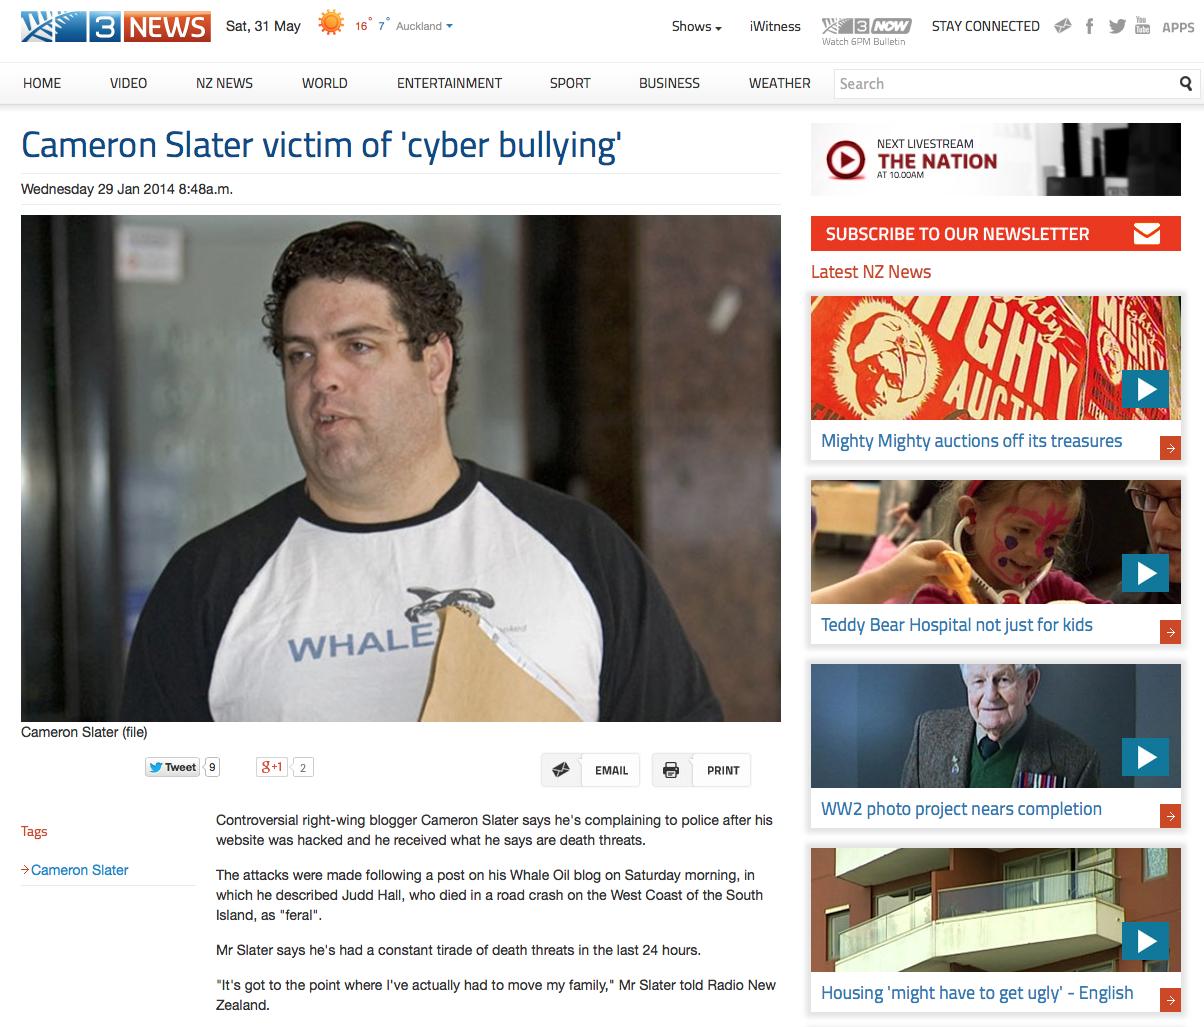 Source: http://www.3news.co.nz/Cameron-Slater-victim-of-cyber-bullying/tabid/423/articleID/330141/Default.aspx